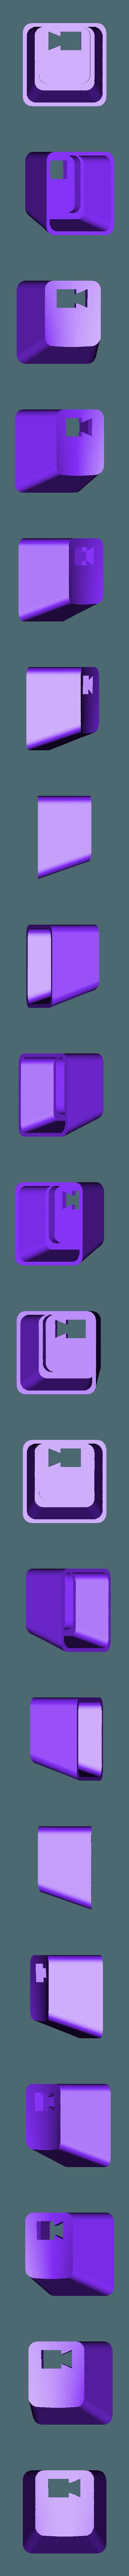 key_rec2.stl Download free STL file Key cap • 3D printing object, MakeItWork